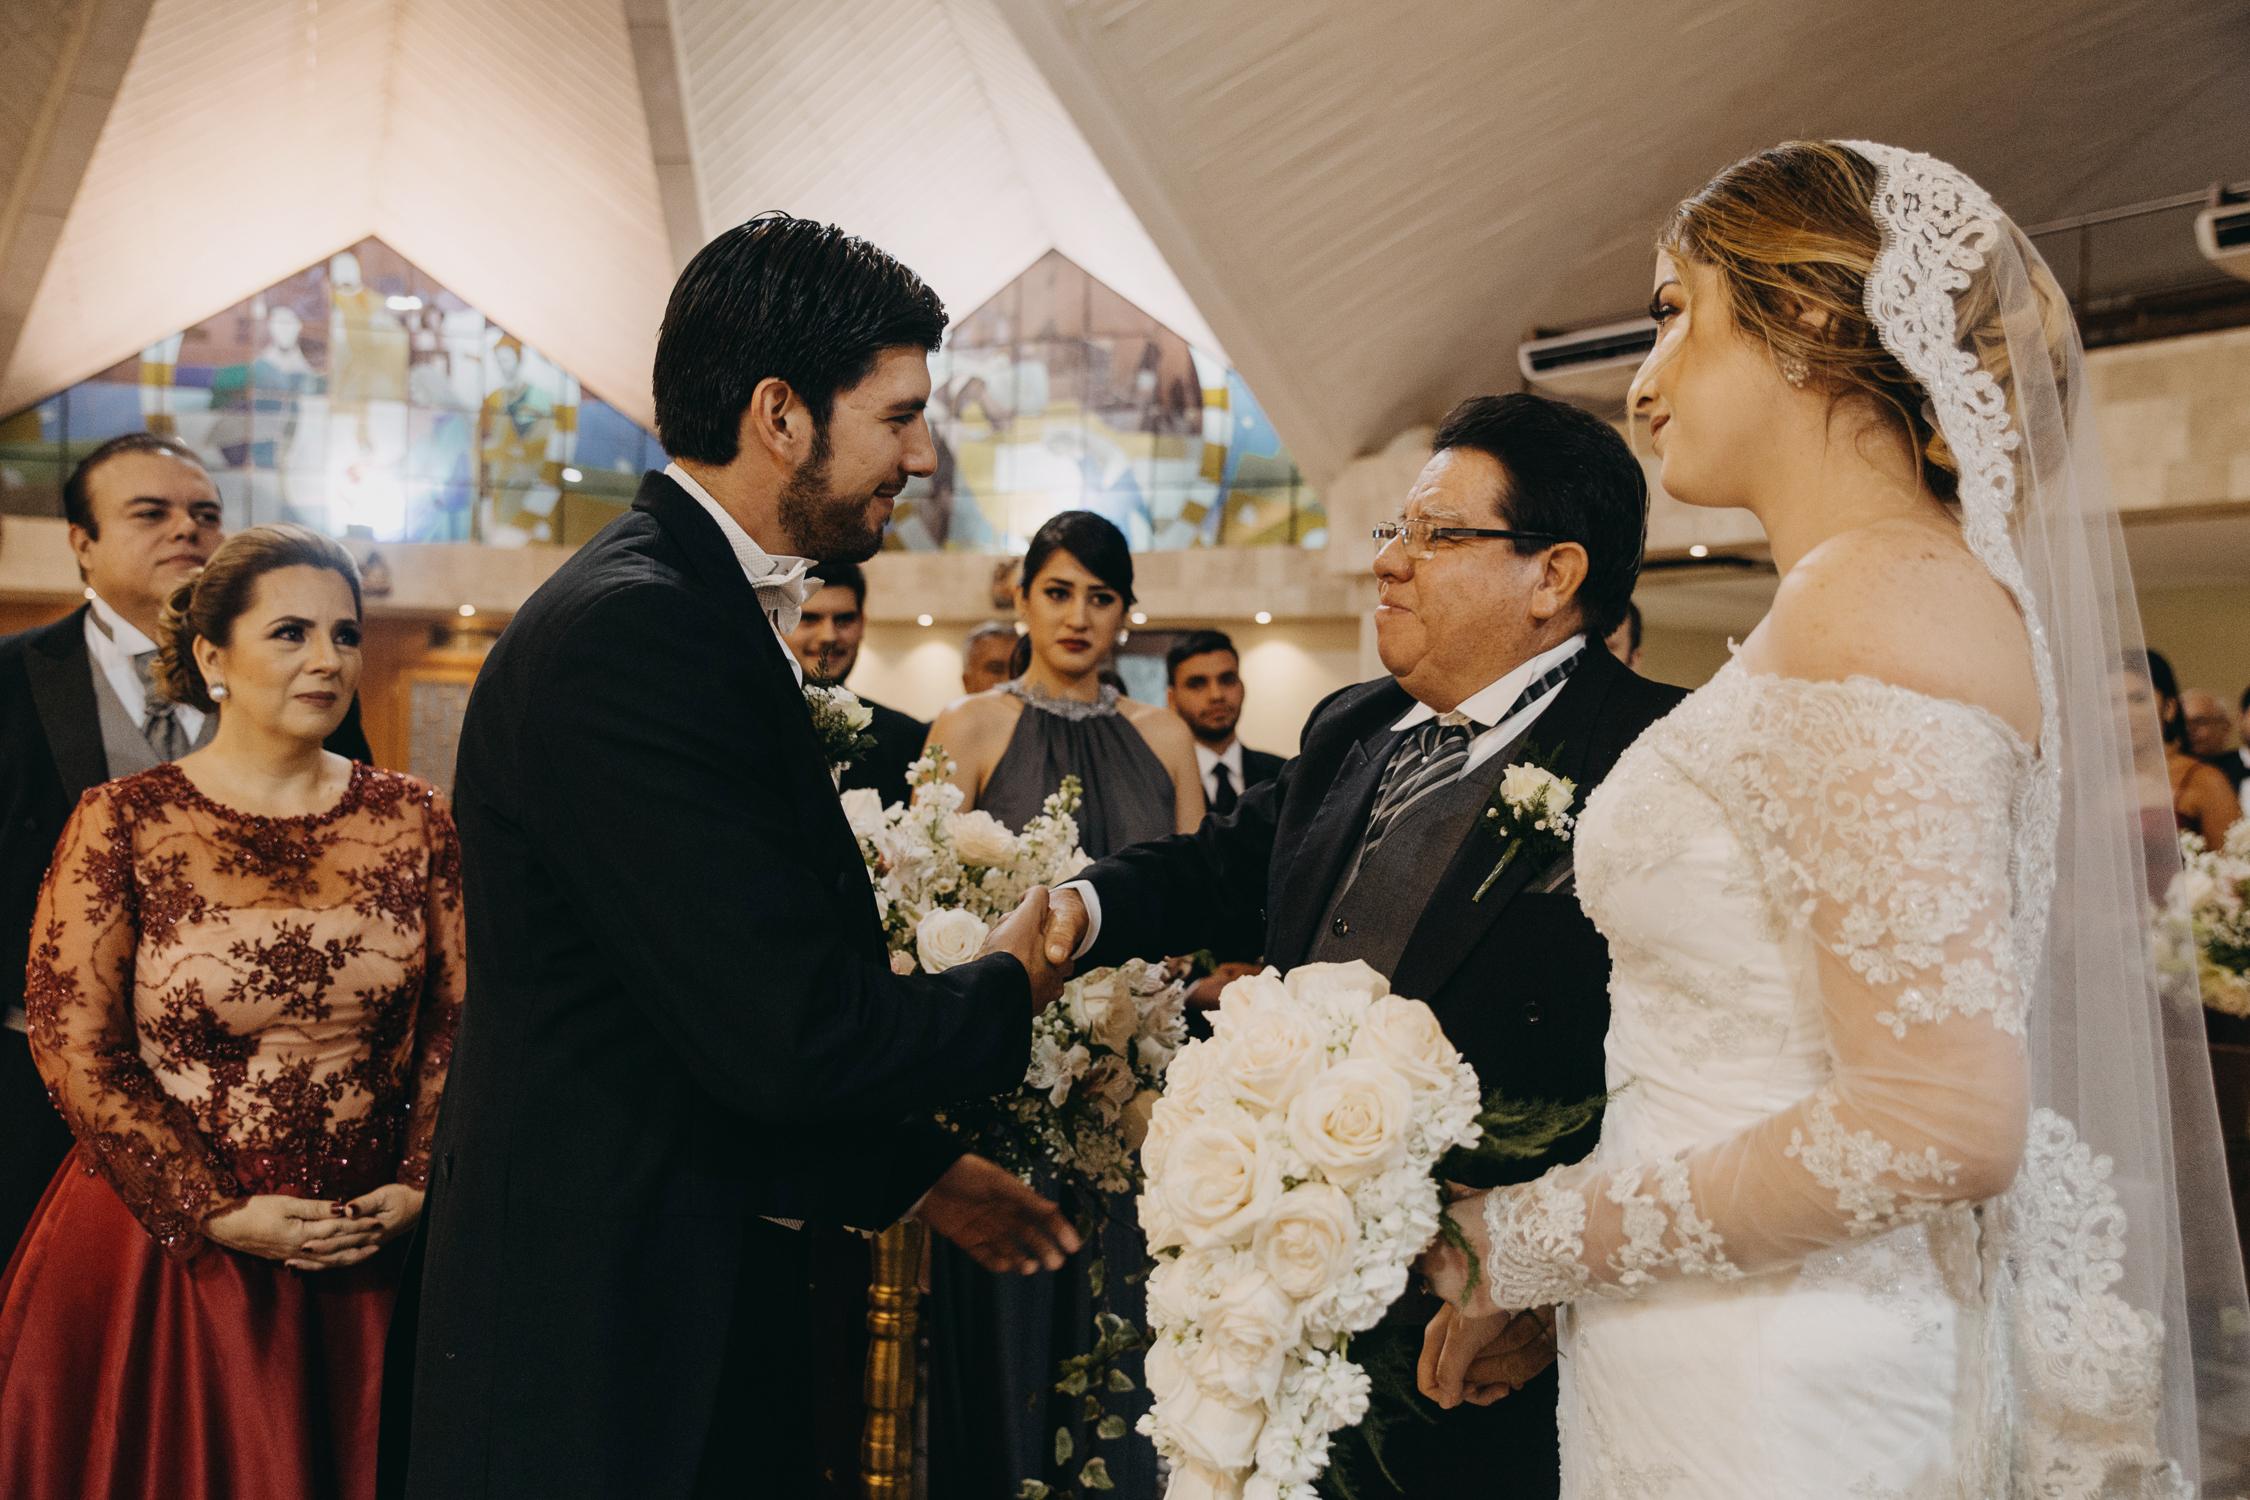 Michelle-Agurto-Fotografia-Bodas-Ecuador-Destination-Wedding-Photographer-Vicky-Javier-55.JPG